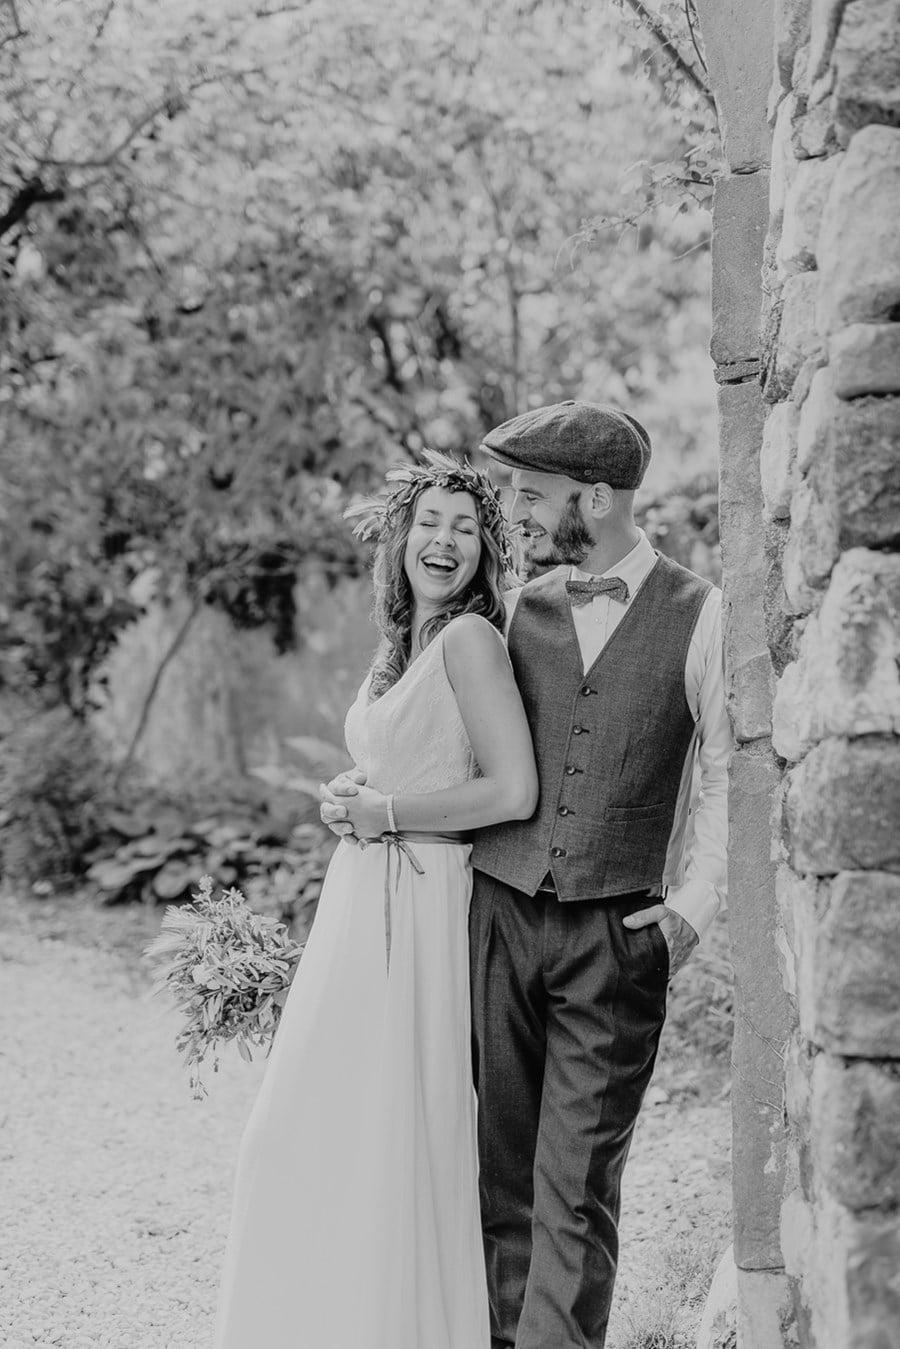 24 Kreative Hochzeit Foto Ideen Posen Wedding Photography